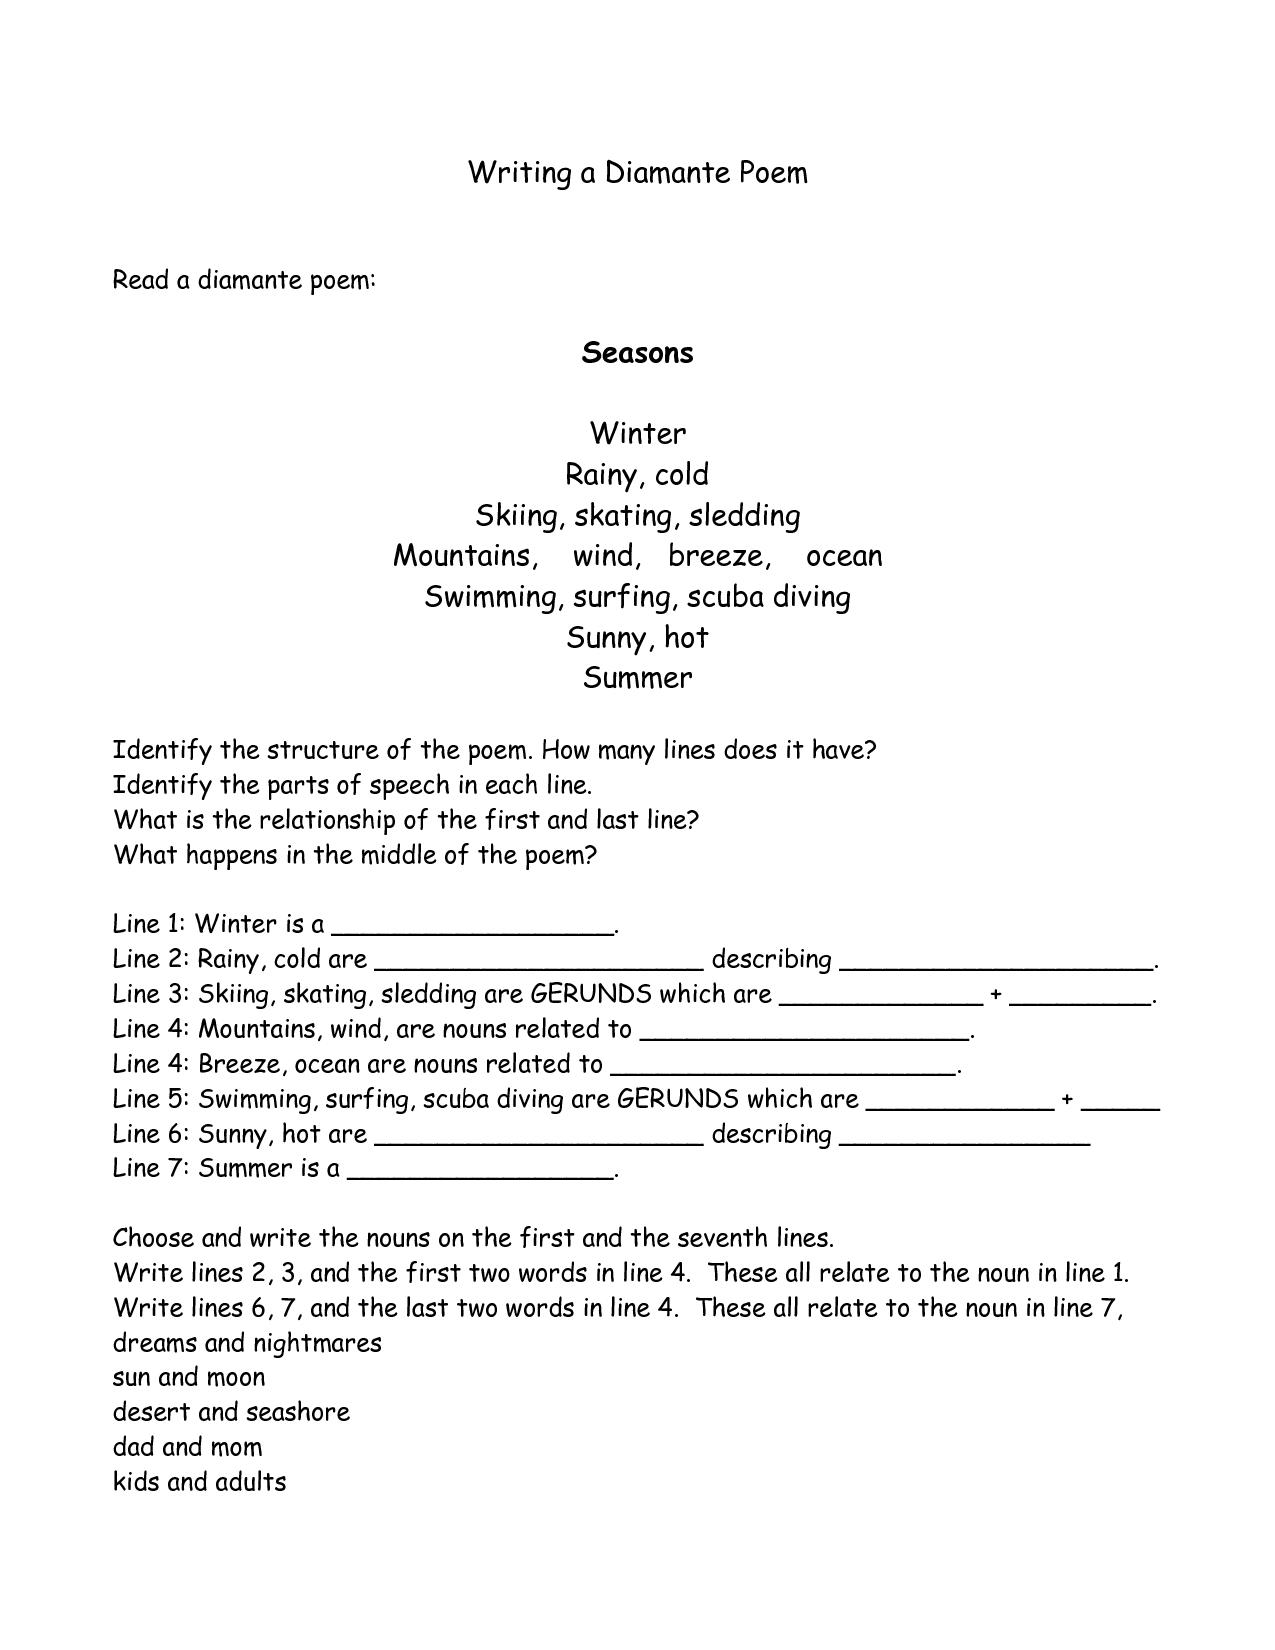 Diamante Poem Writing Assignment